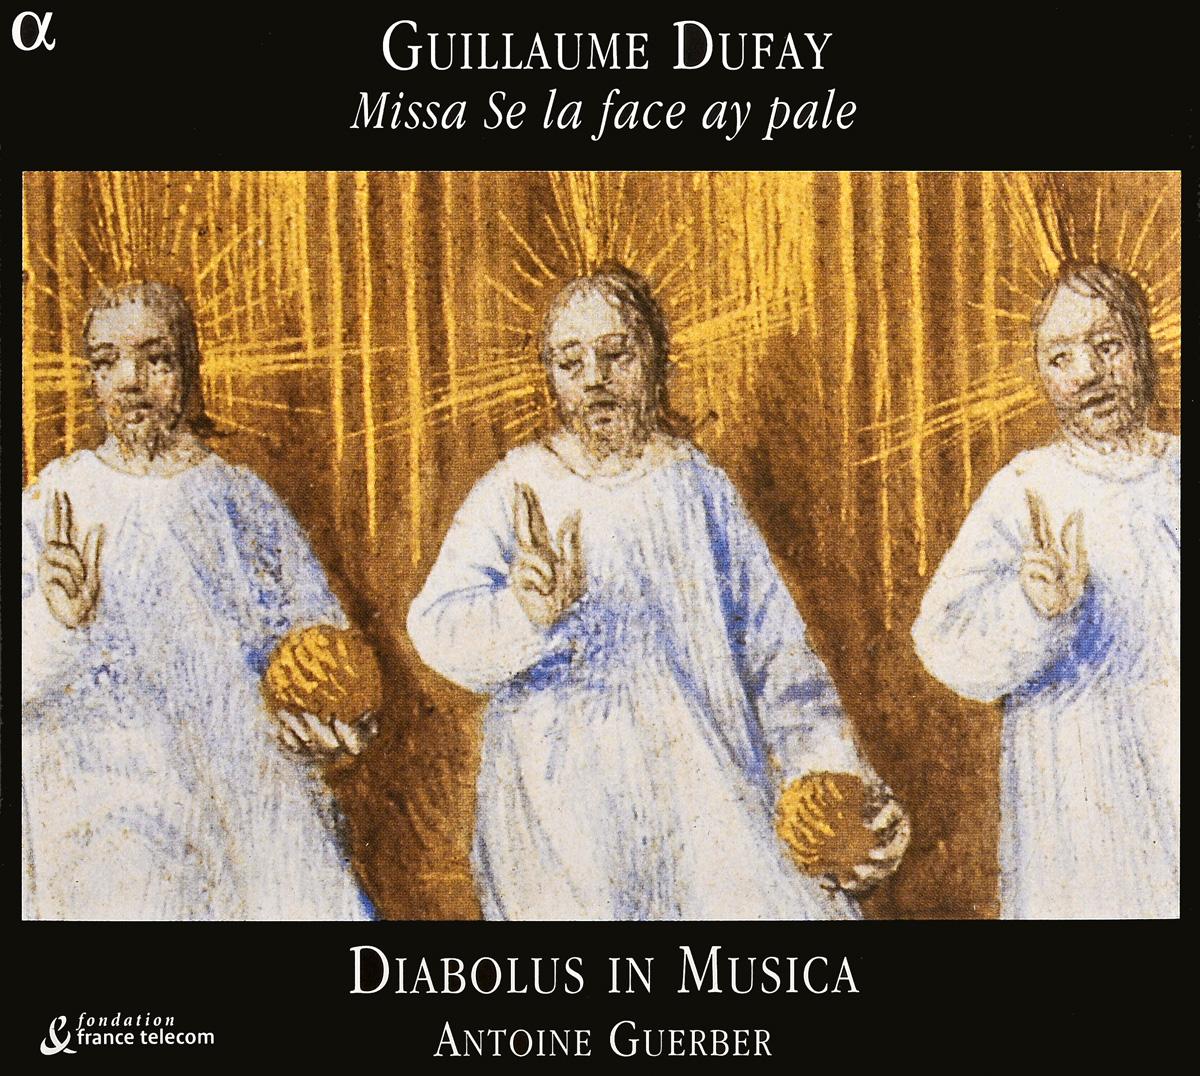 Guillaume Dufay - Diabolus In Musica, Antoine Guerber. Missa Se La Face Ay Pale guillaume antoine olivier entomologie tome 6